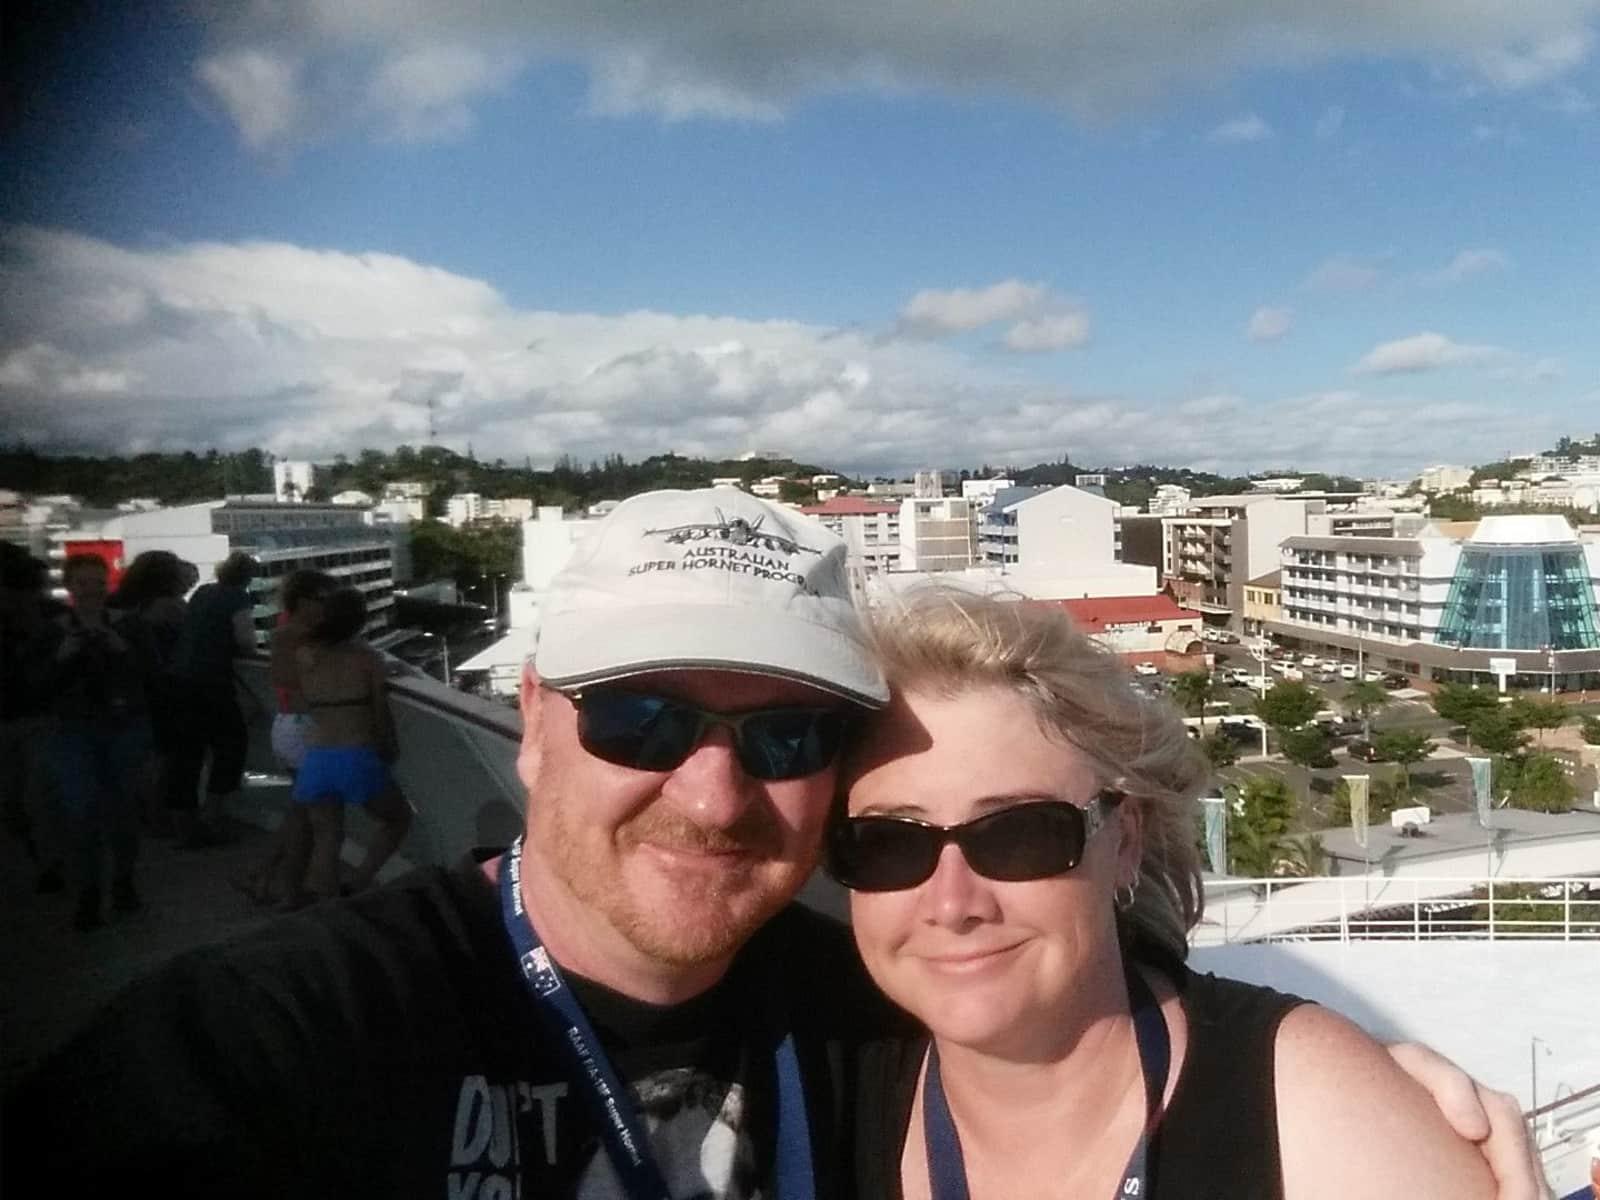 Samantha & Grant from Canberra, Australian Capital Territory, Australia